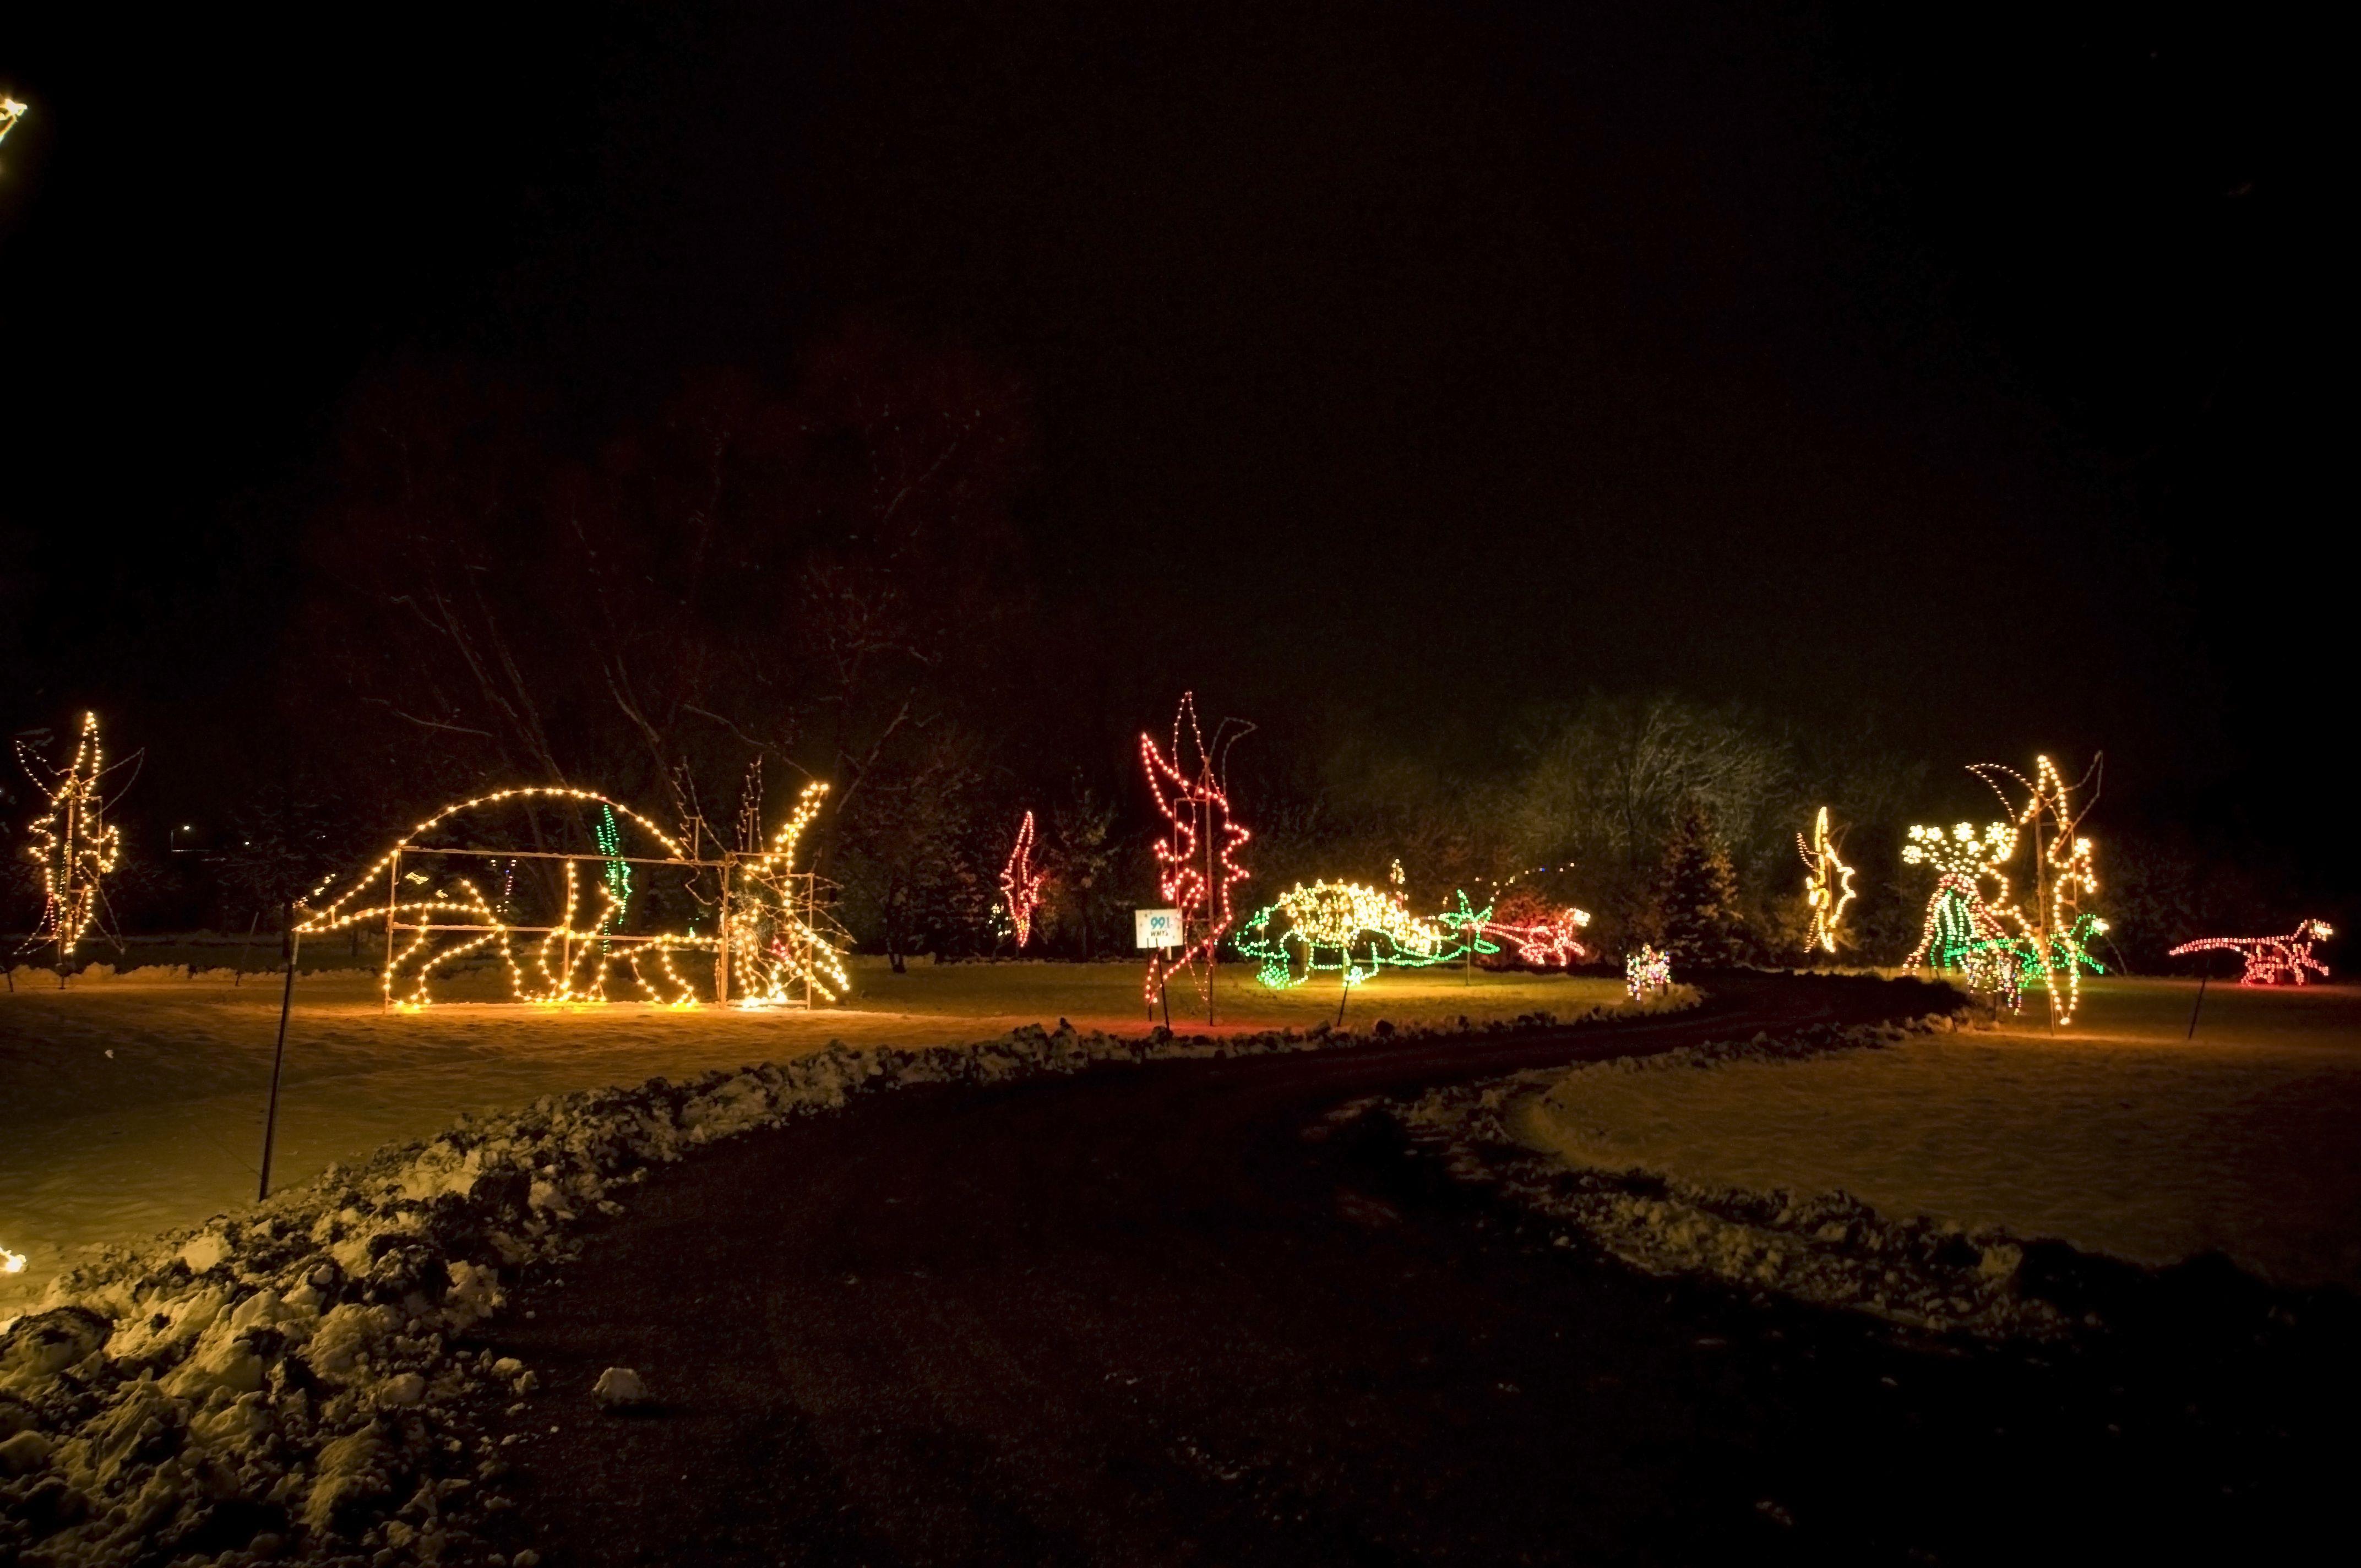 dinosaur christmas lights display at country christmas - Country Springs Christmas Lights